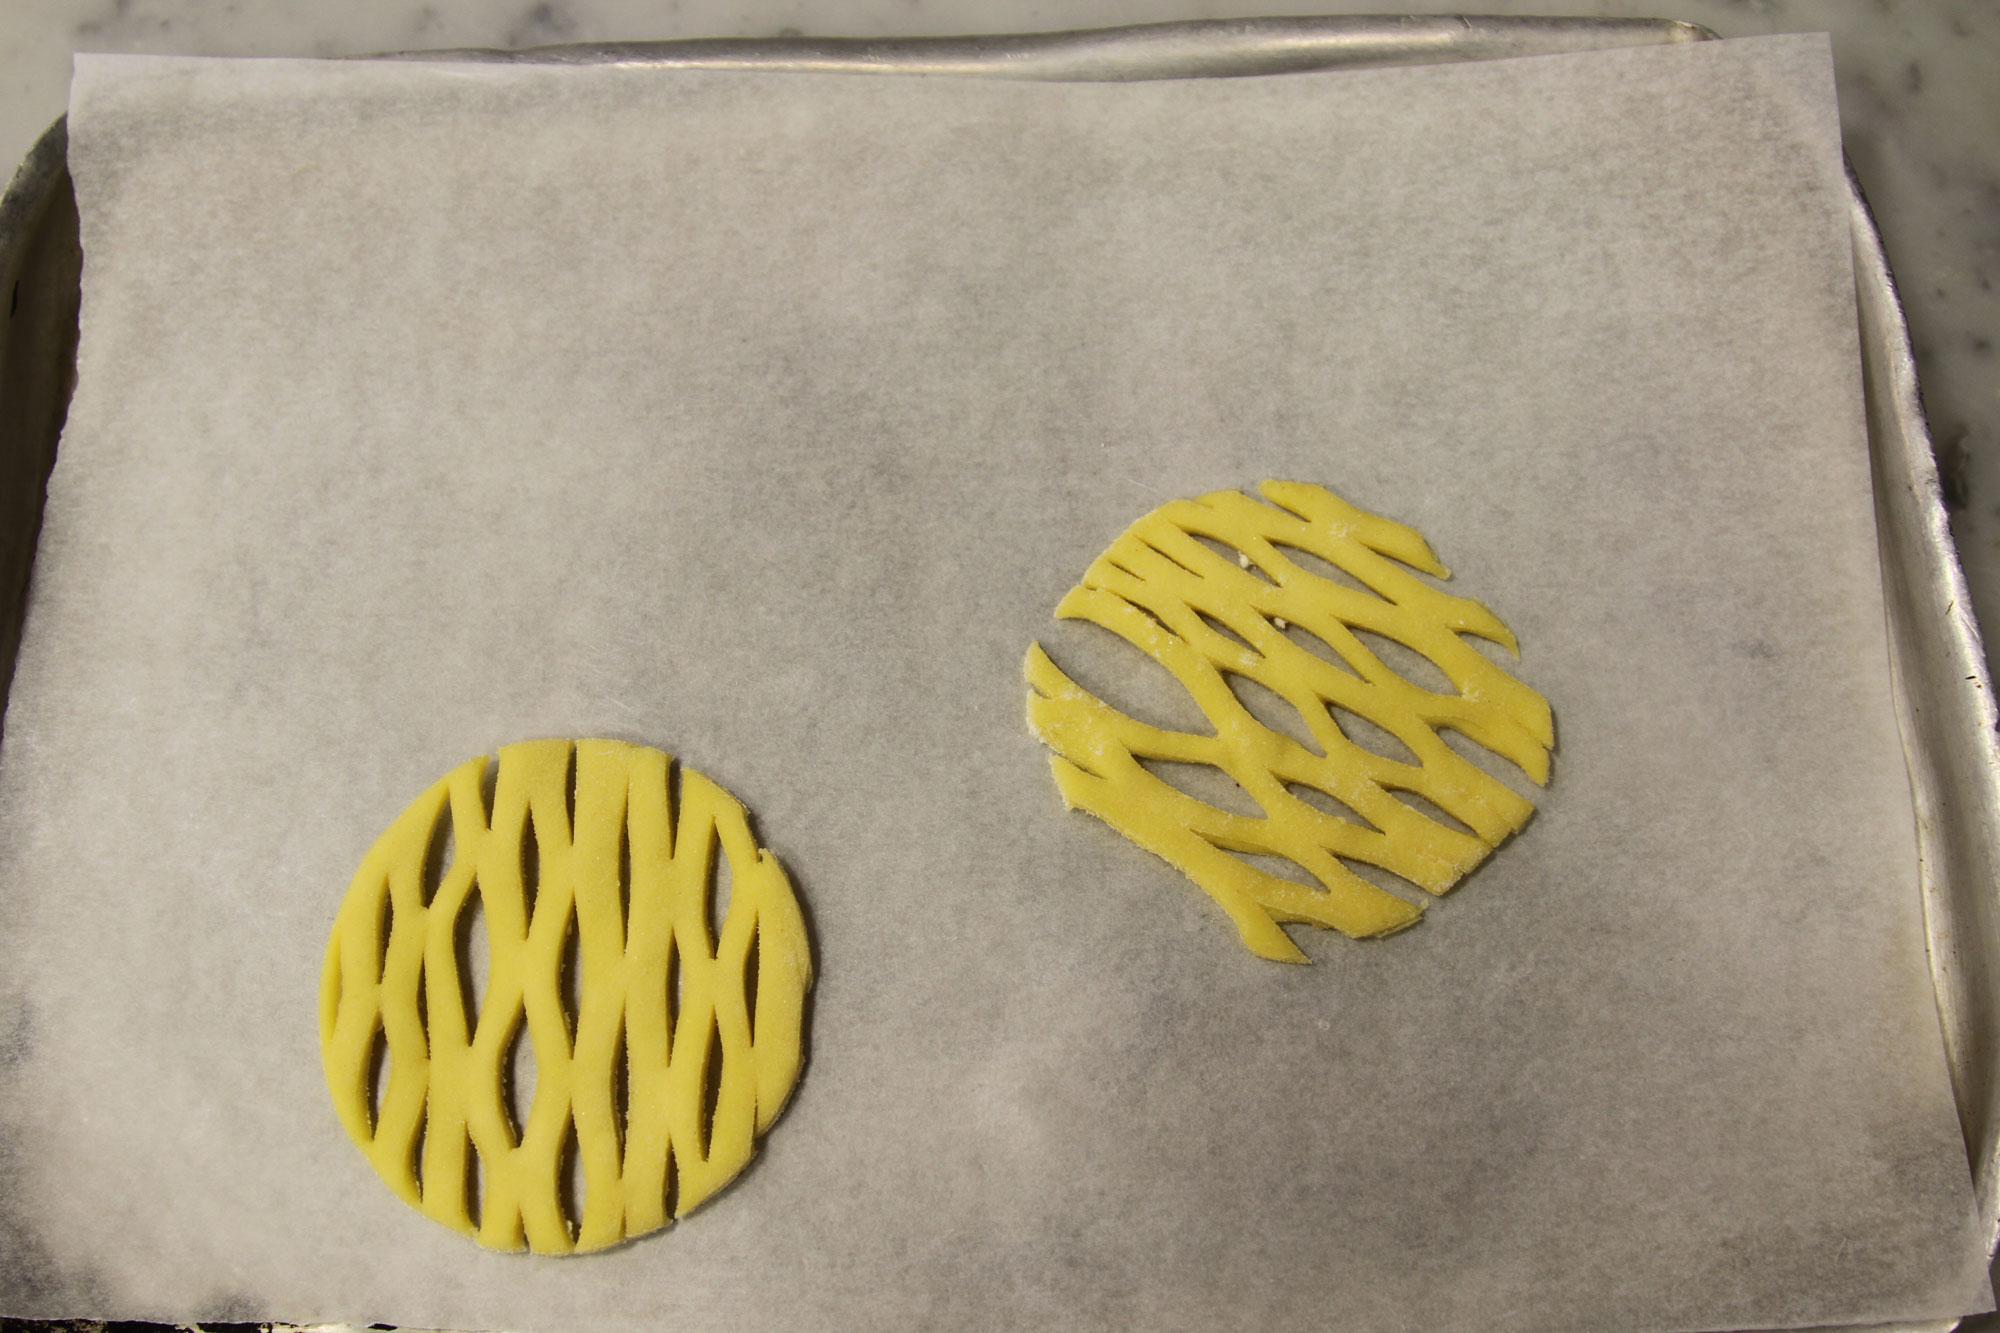 calum-franklin-pastry-lids